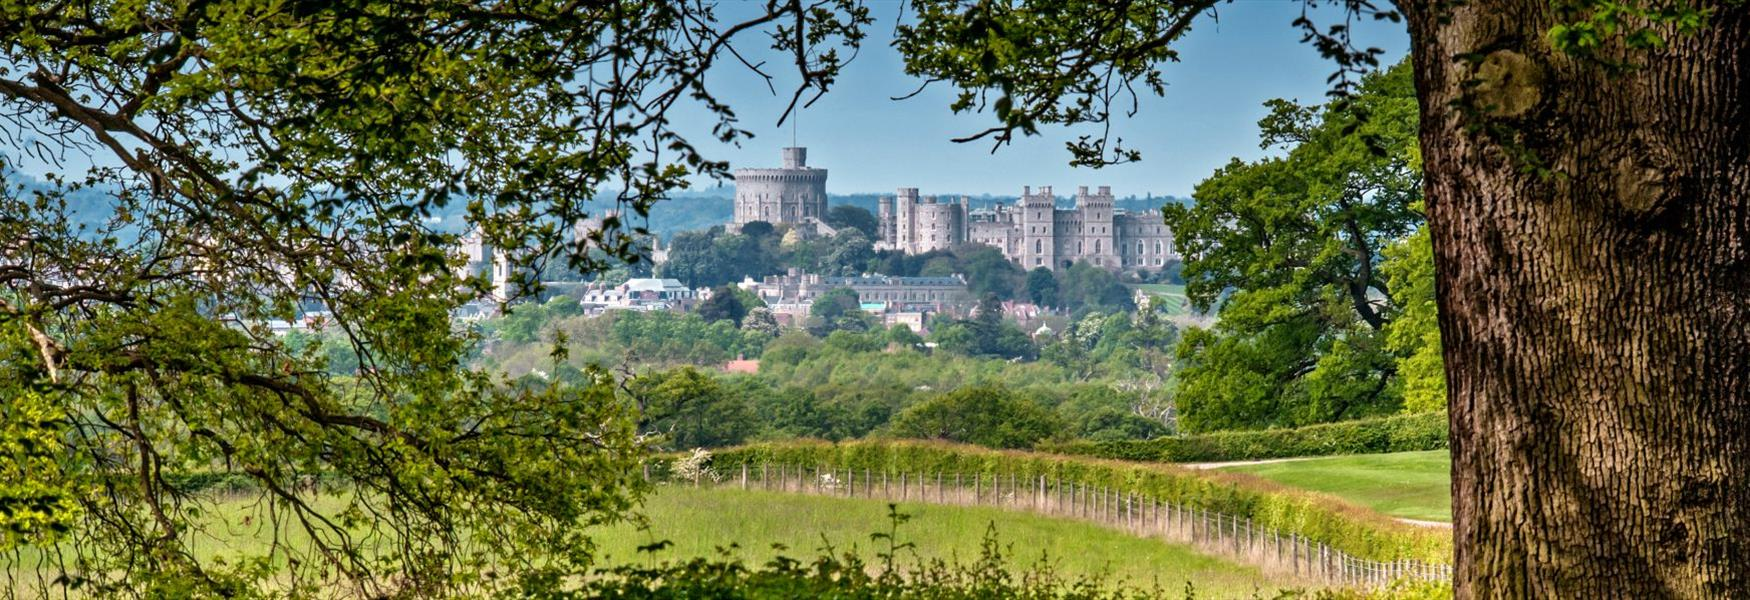 Rediscover the Royal Borough